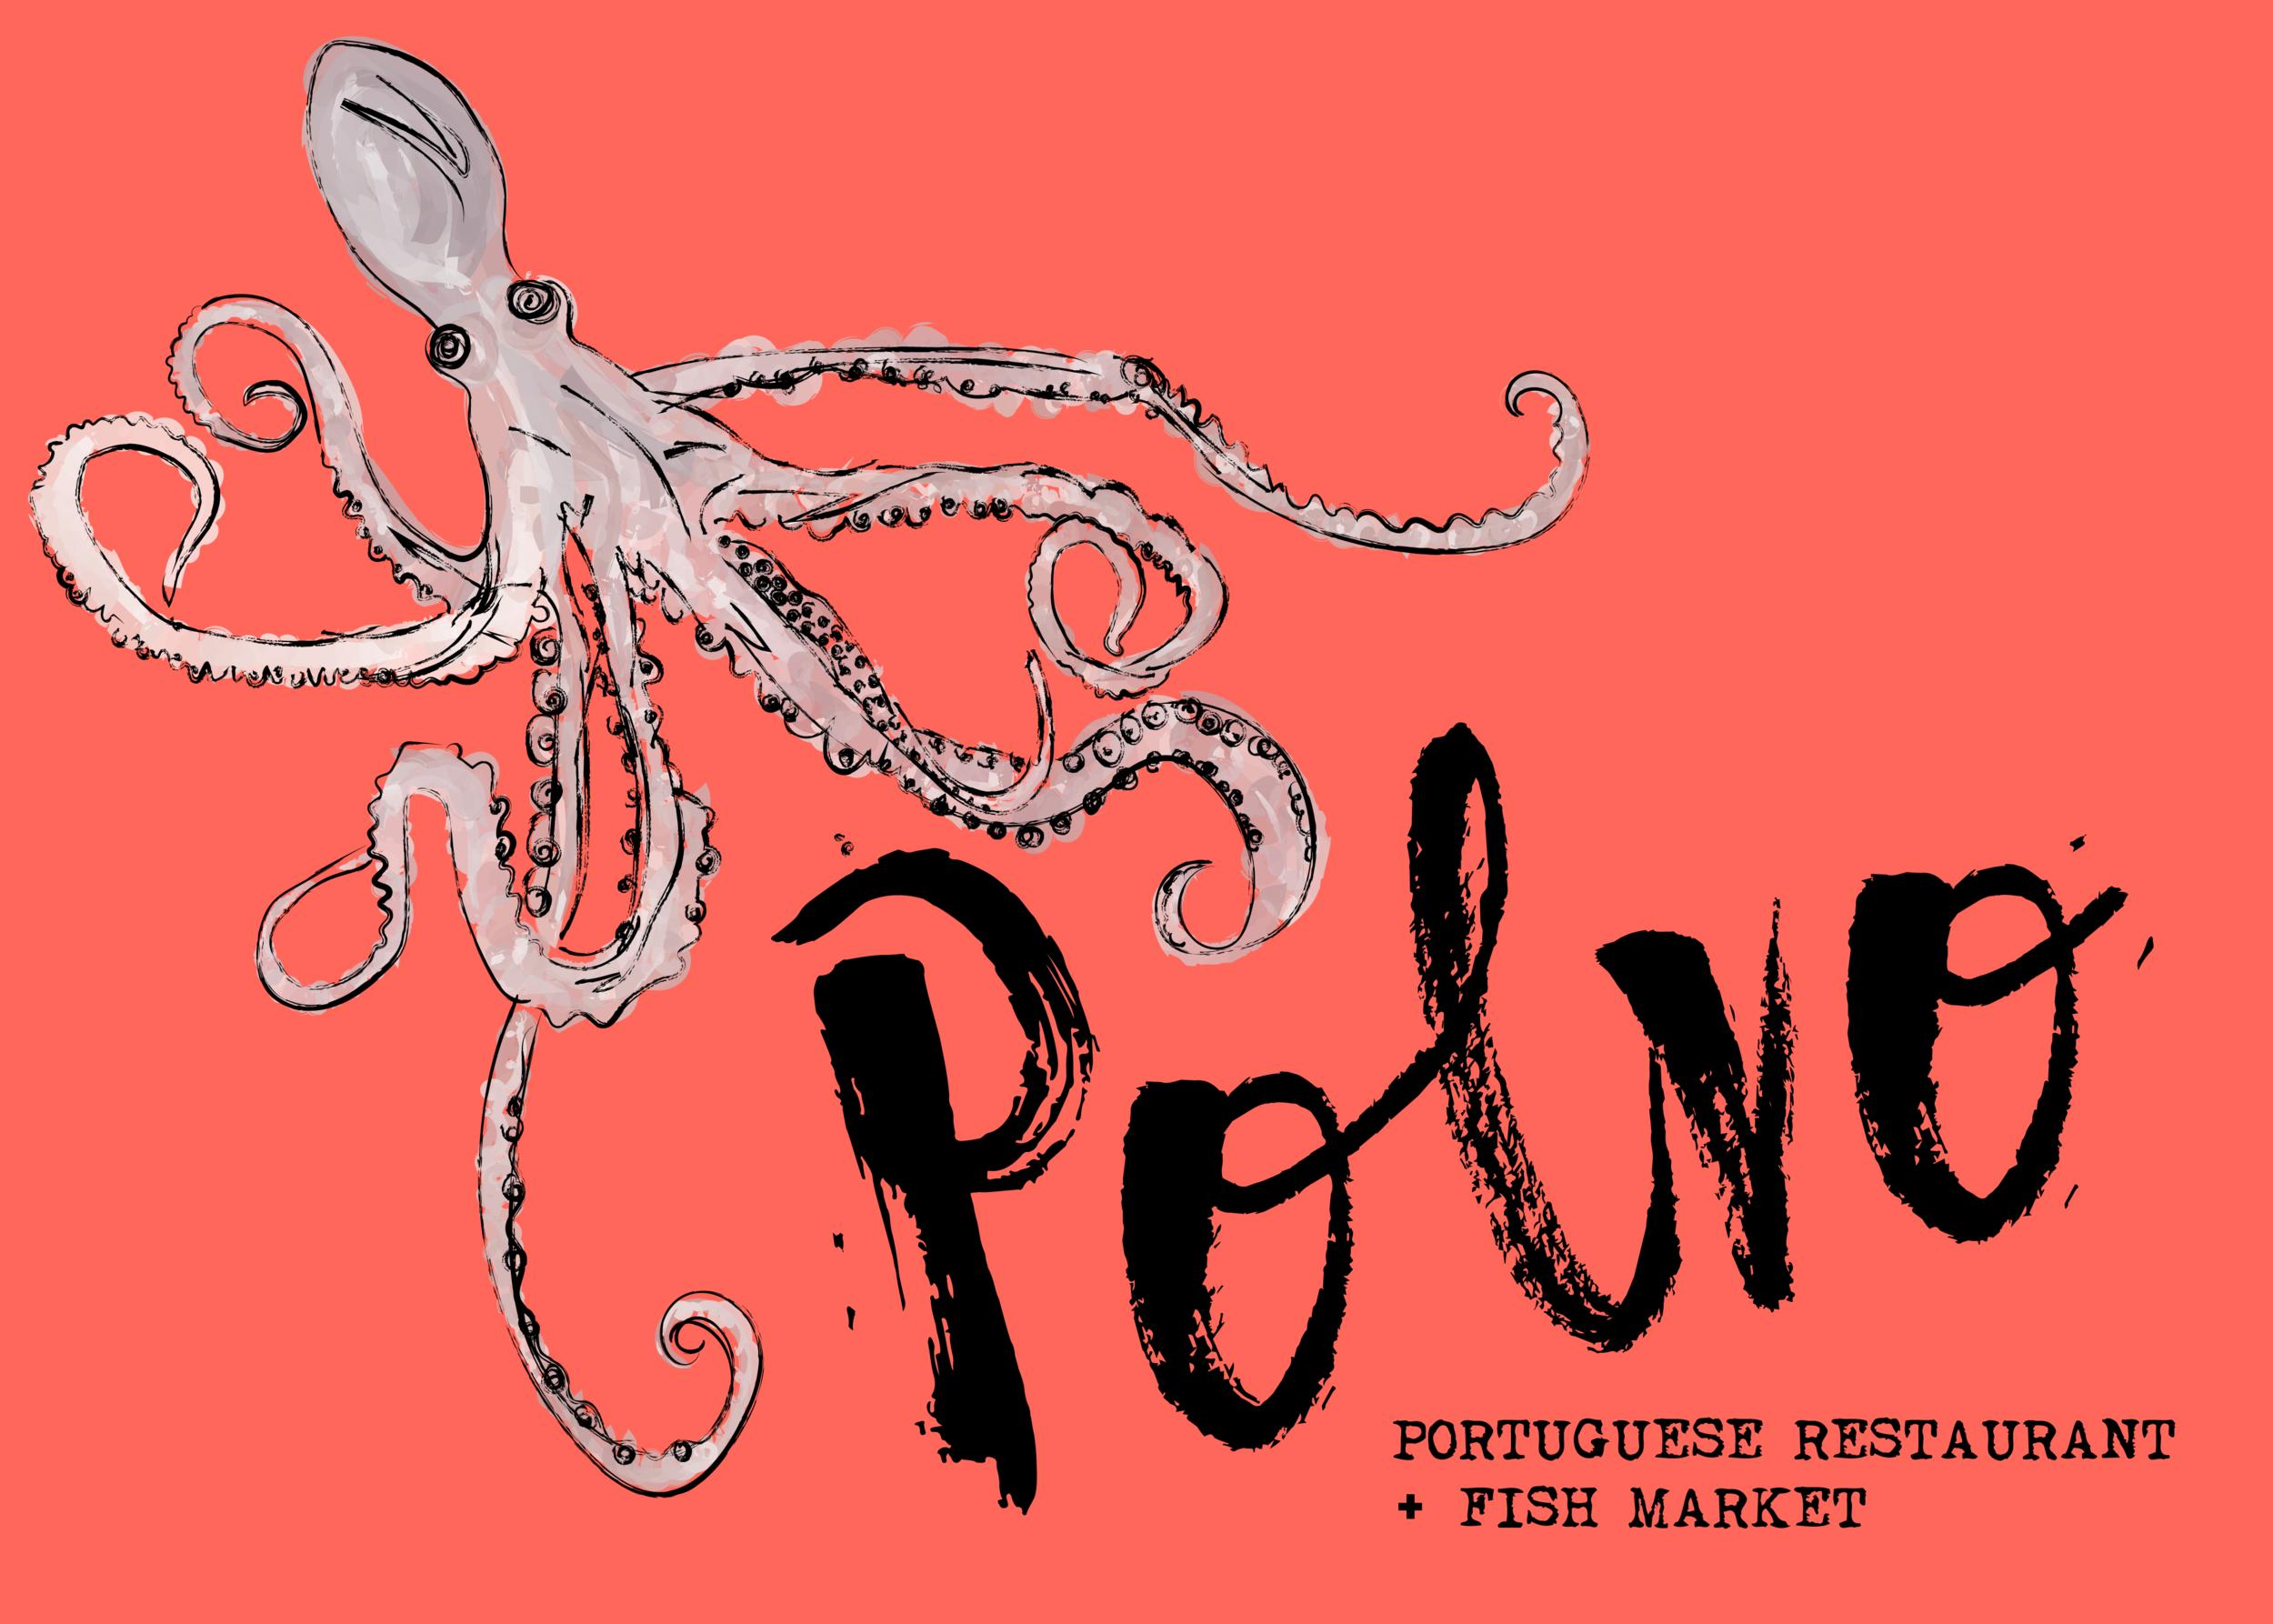 Polvo Portuguese Restaurant and Market